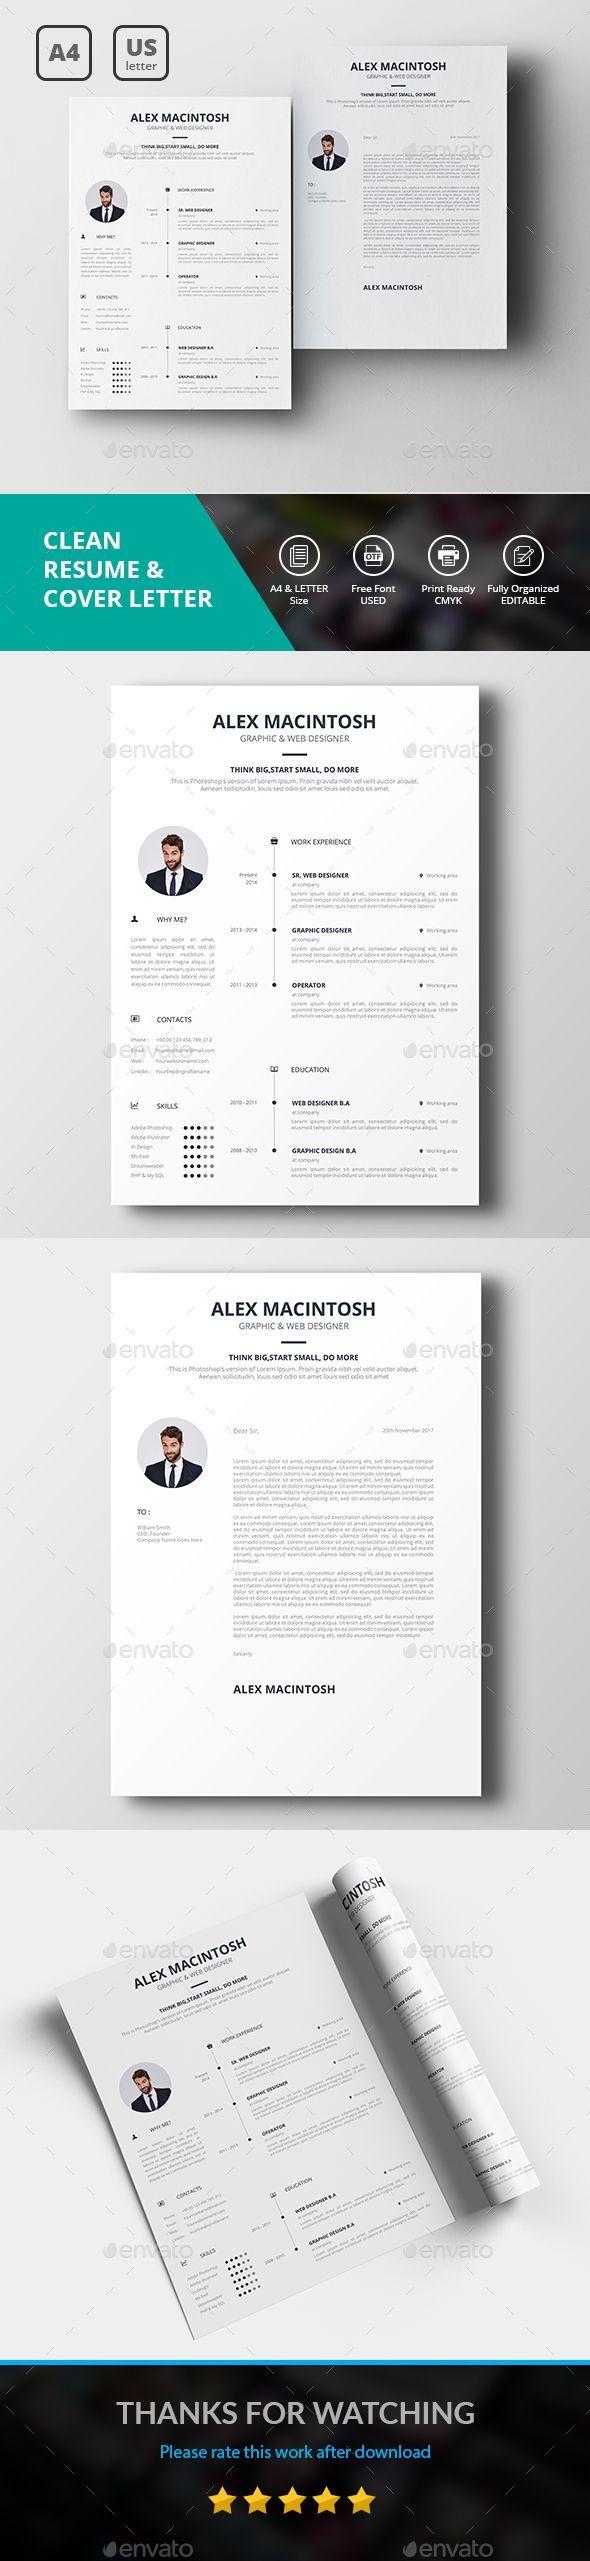 best resume cover letters ideas pinterest letter | Home Design Idea ...